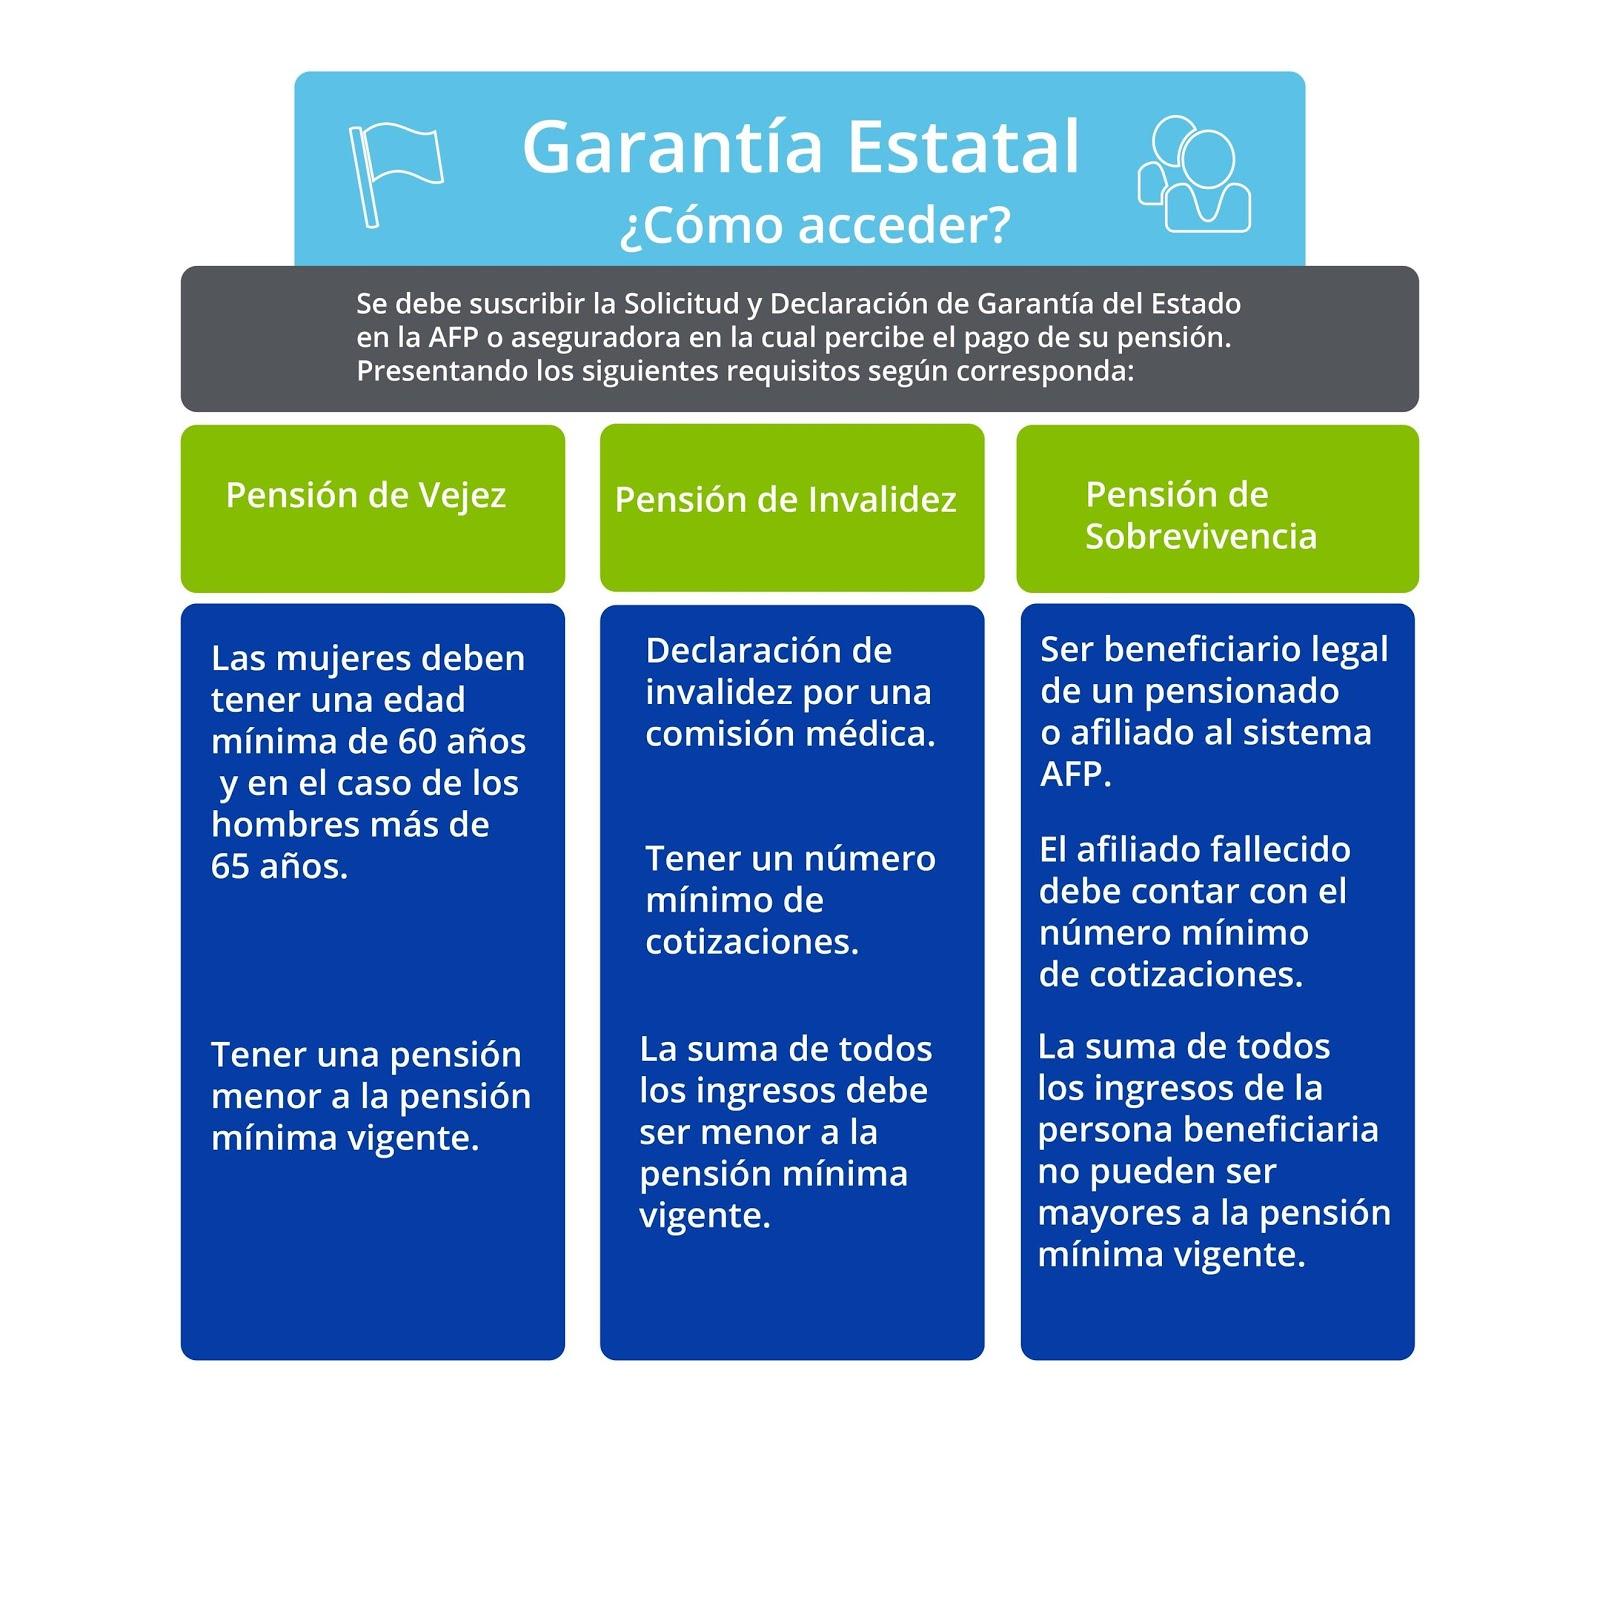 https://confiar.entuidioma.cl/hubfs/Nota_7_-_Garantia_estatal_Correciones_Paty-01-1.jpg